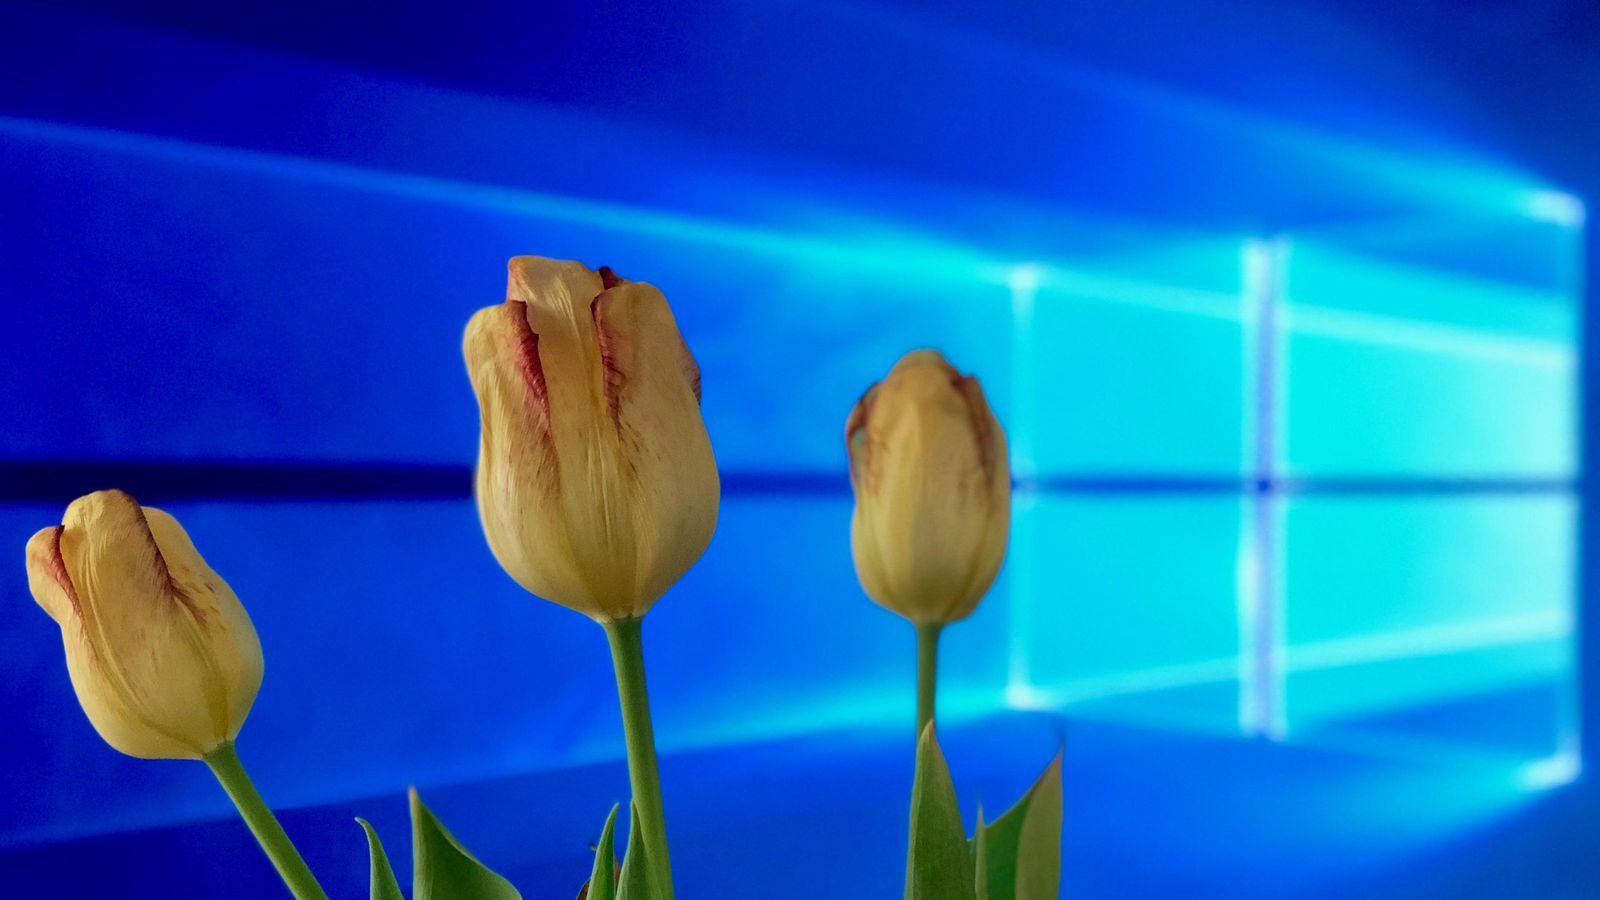 Windows 10 Spring Creators Update : ست خصائص في تحديث ويندوز 10